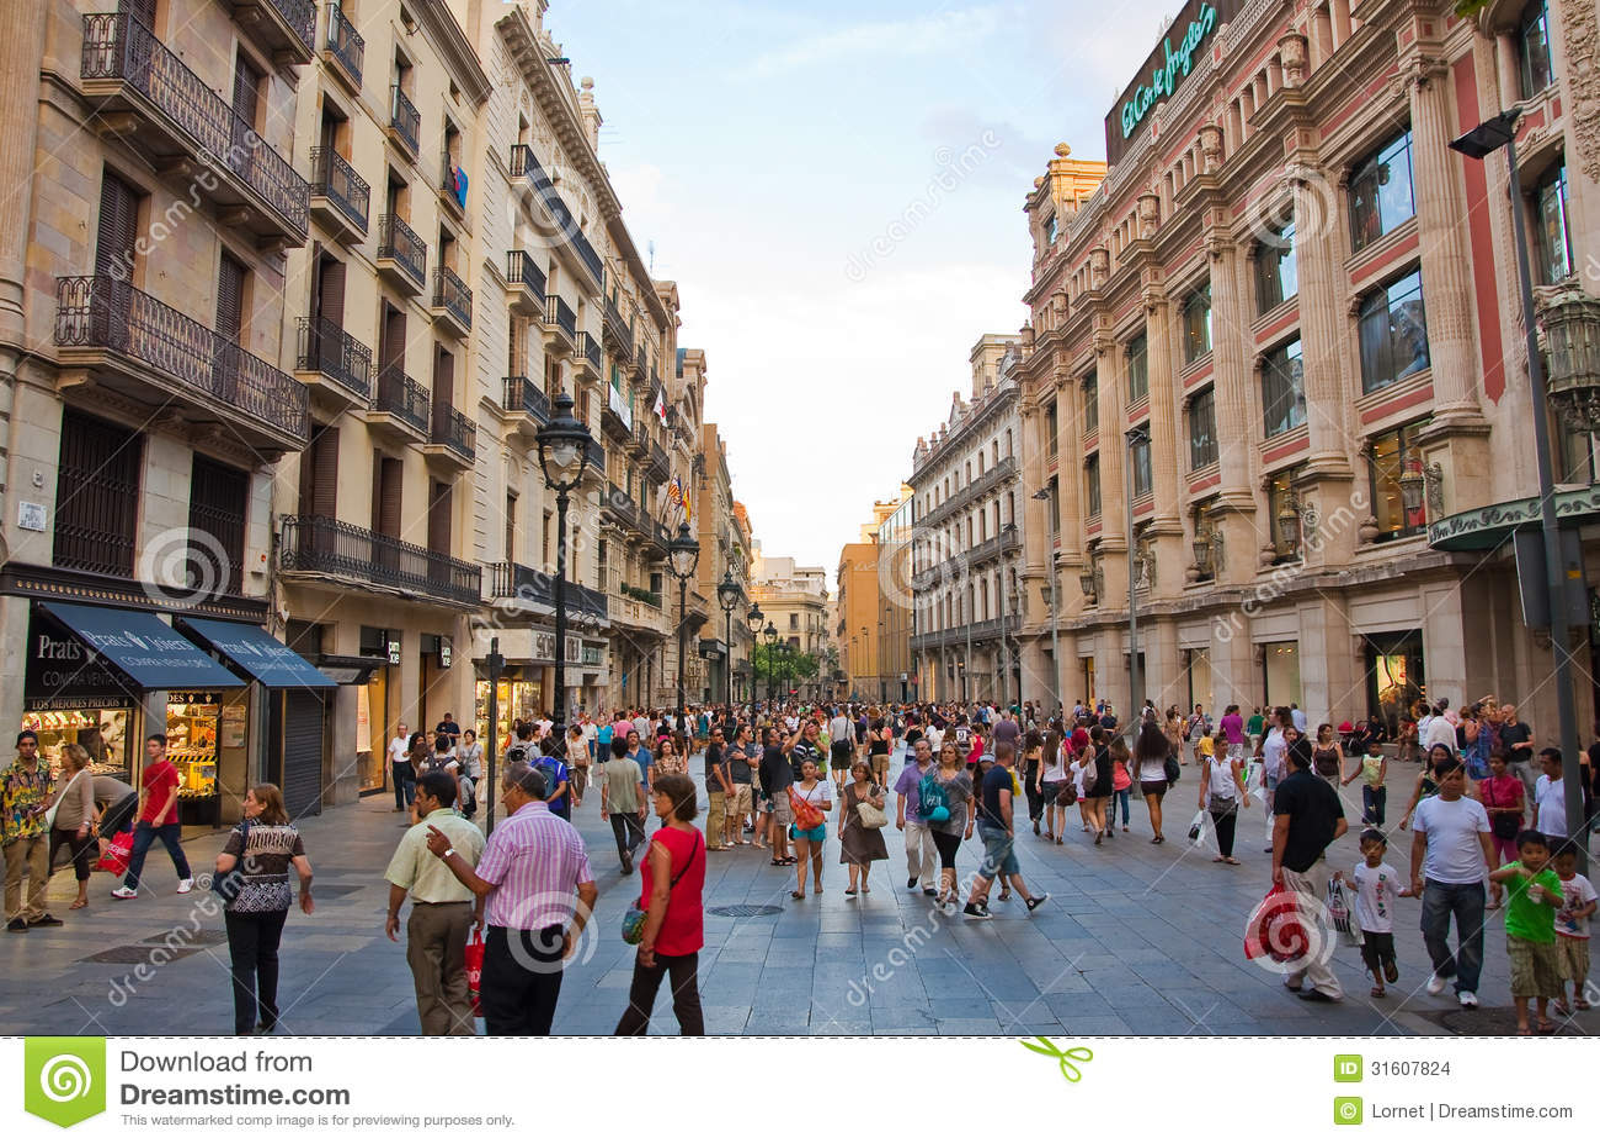 Rua da compra em Barcelona.